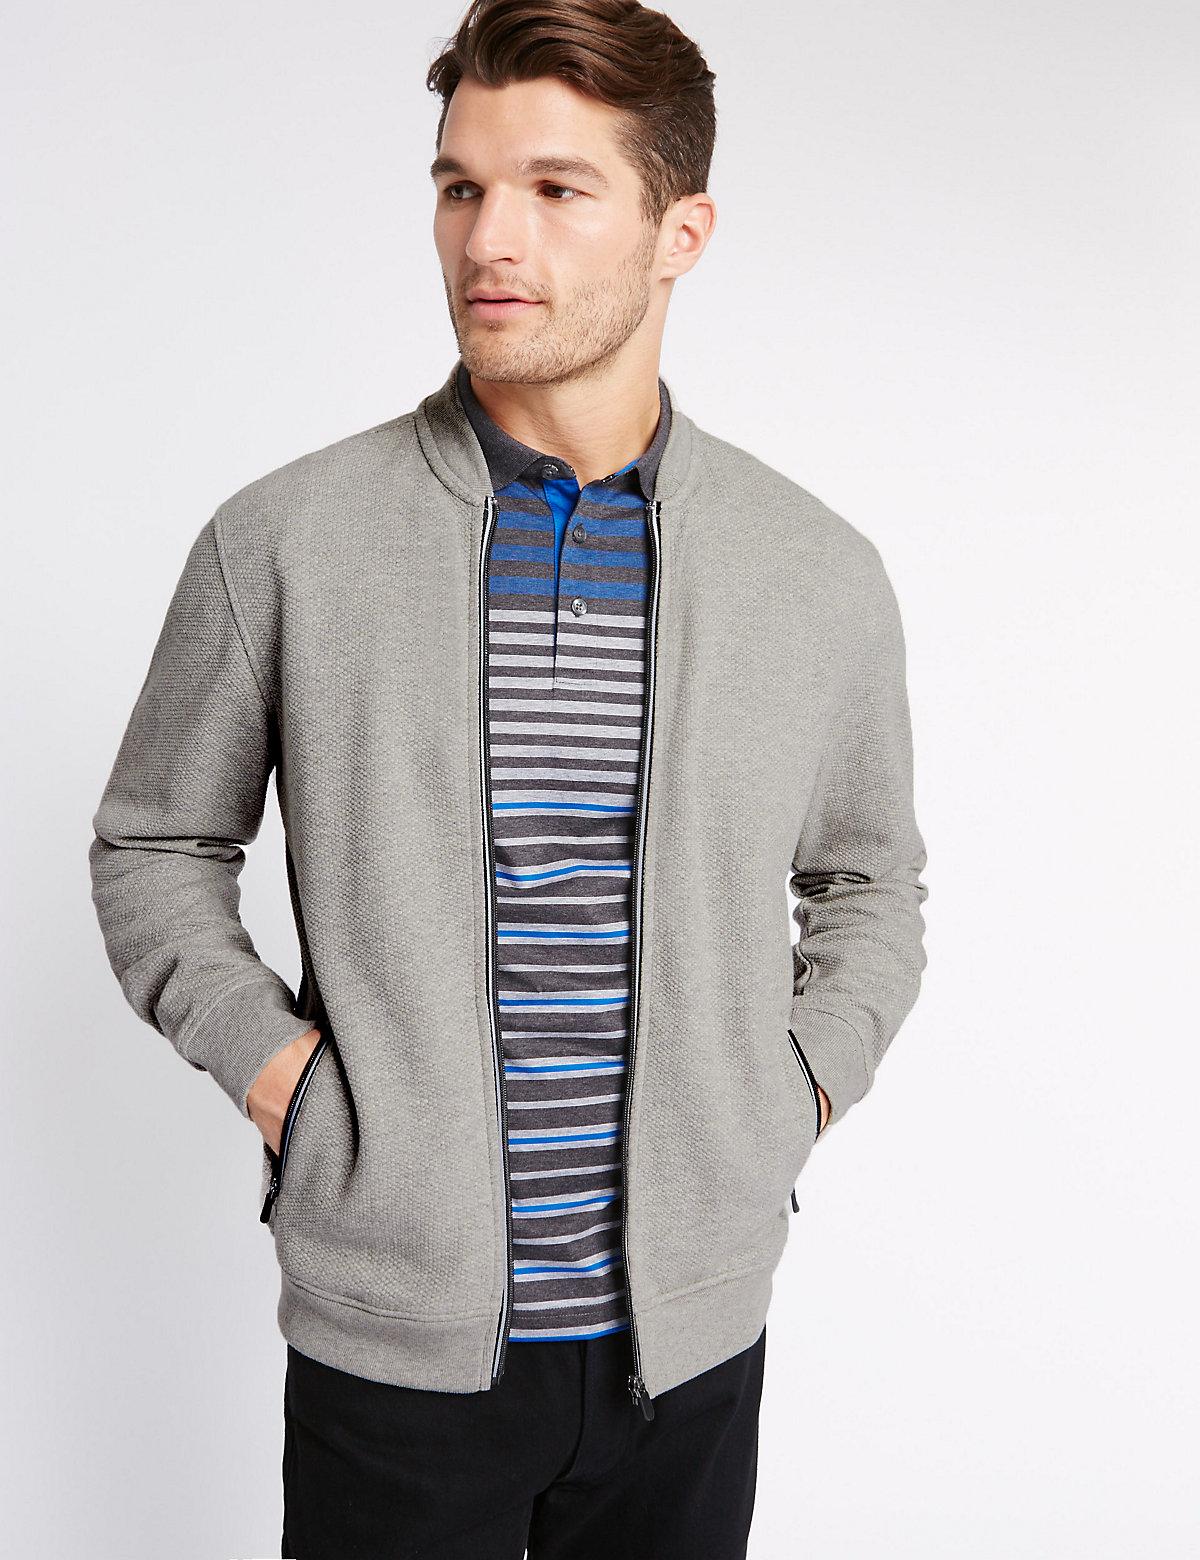 Image of Blue Harbour Pure Cotton Textured Baseball Sweatshirt